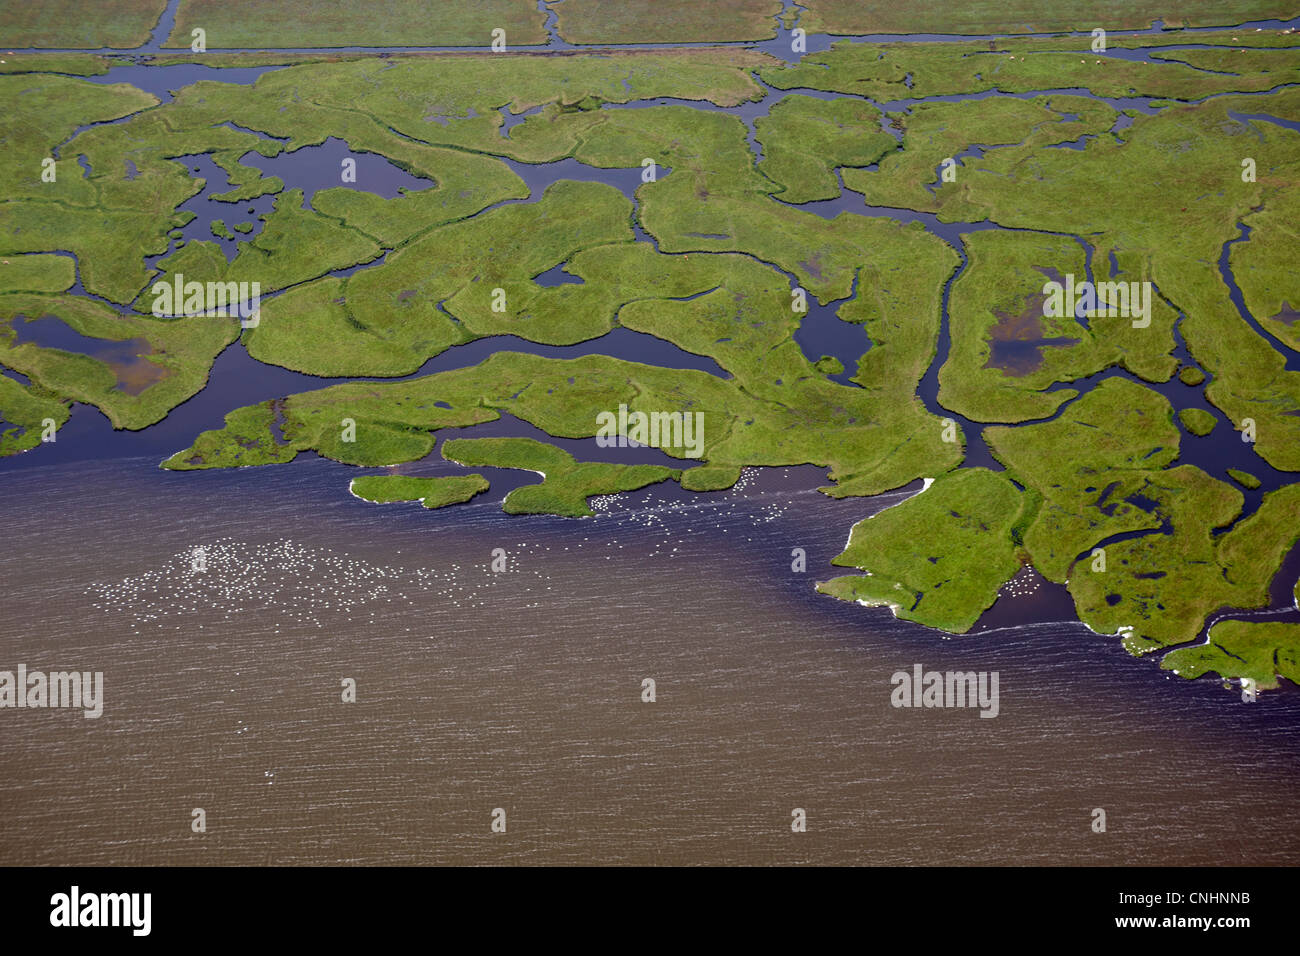 Varios ríos que desembocan en un cuerpo de agua, vista aérea Imagen De Stock